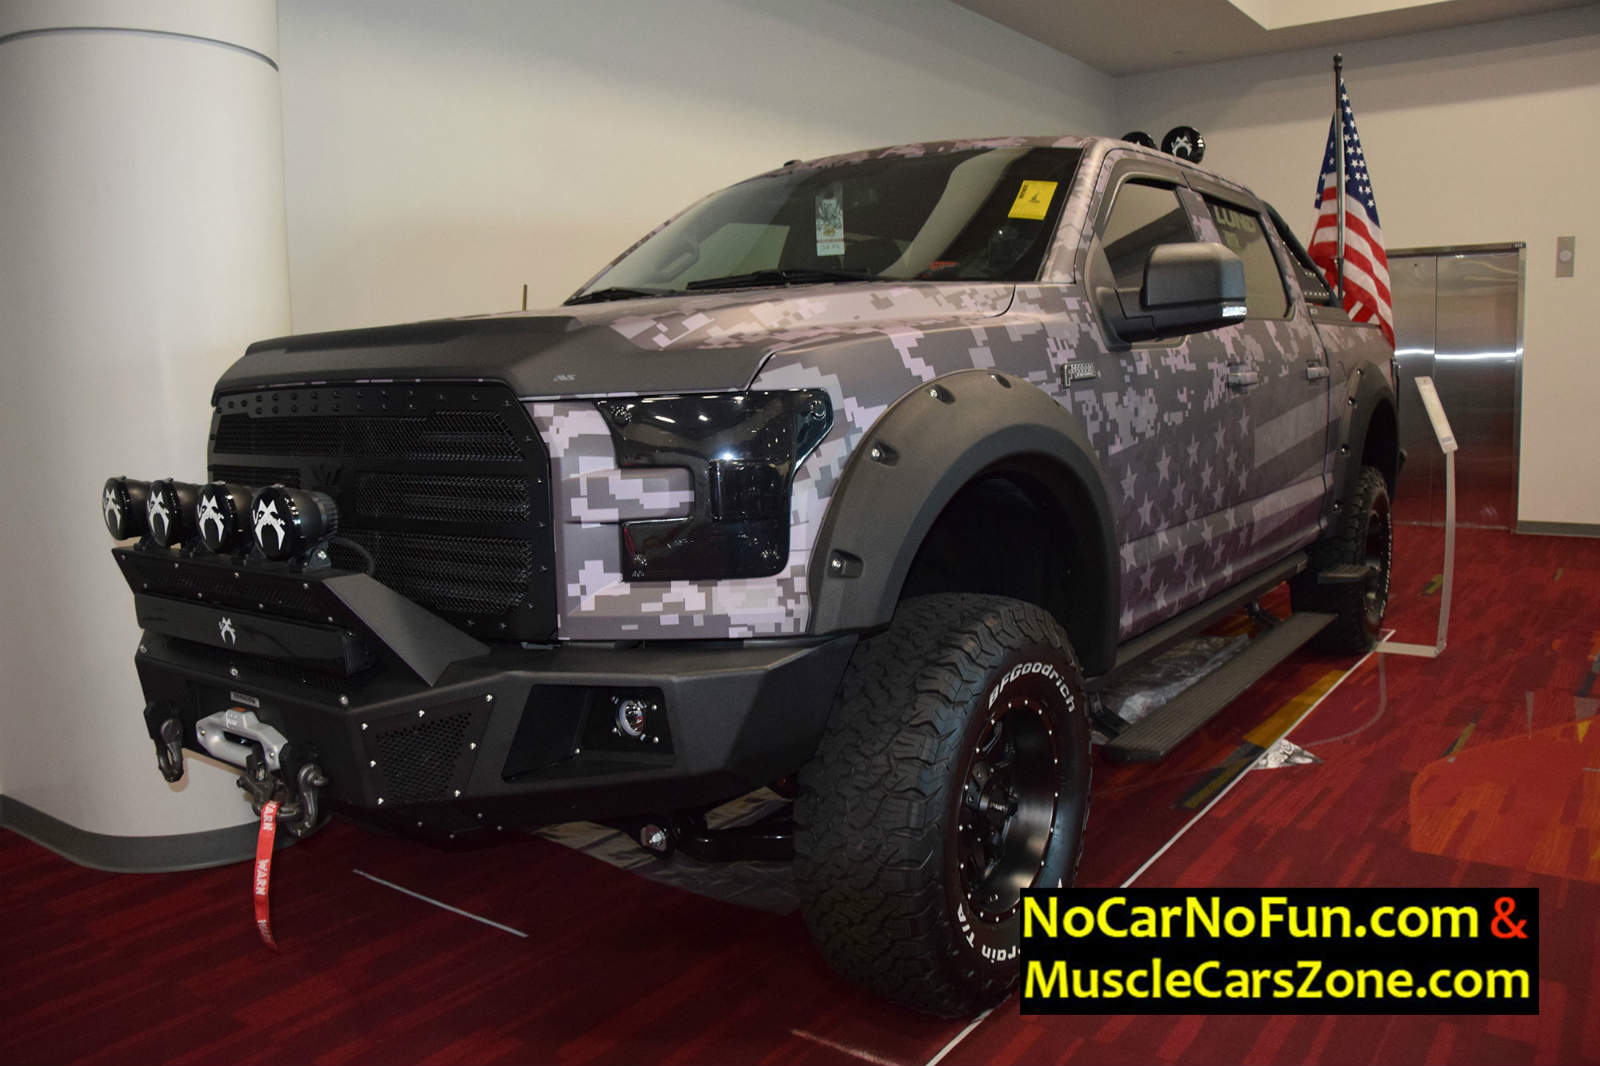 Lifted Truck Iphone Wallpaper Grey Custom Truck With American Flag Paint Job At Sema